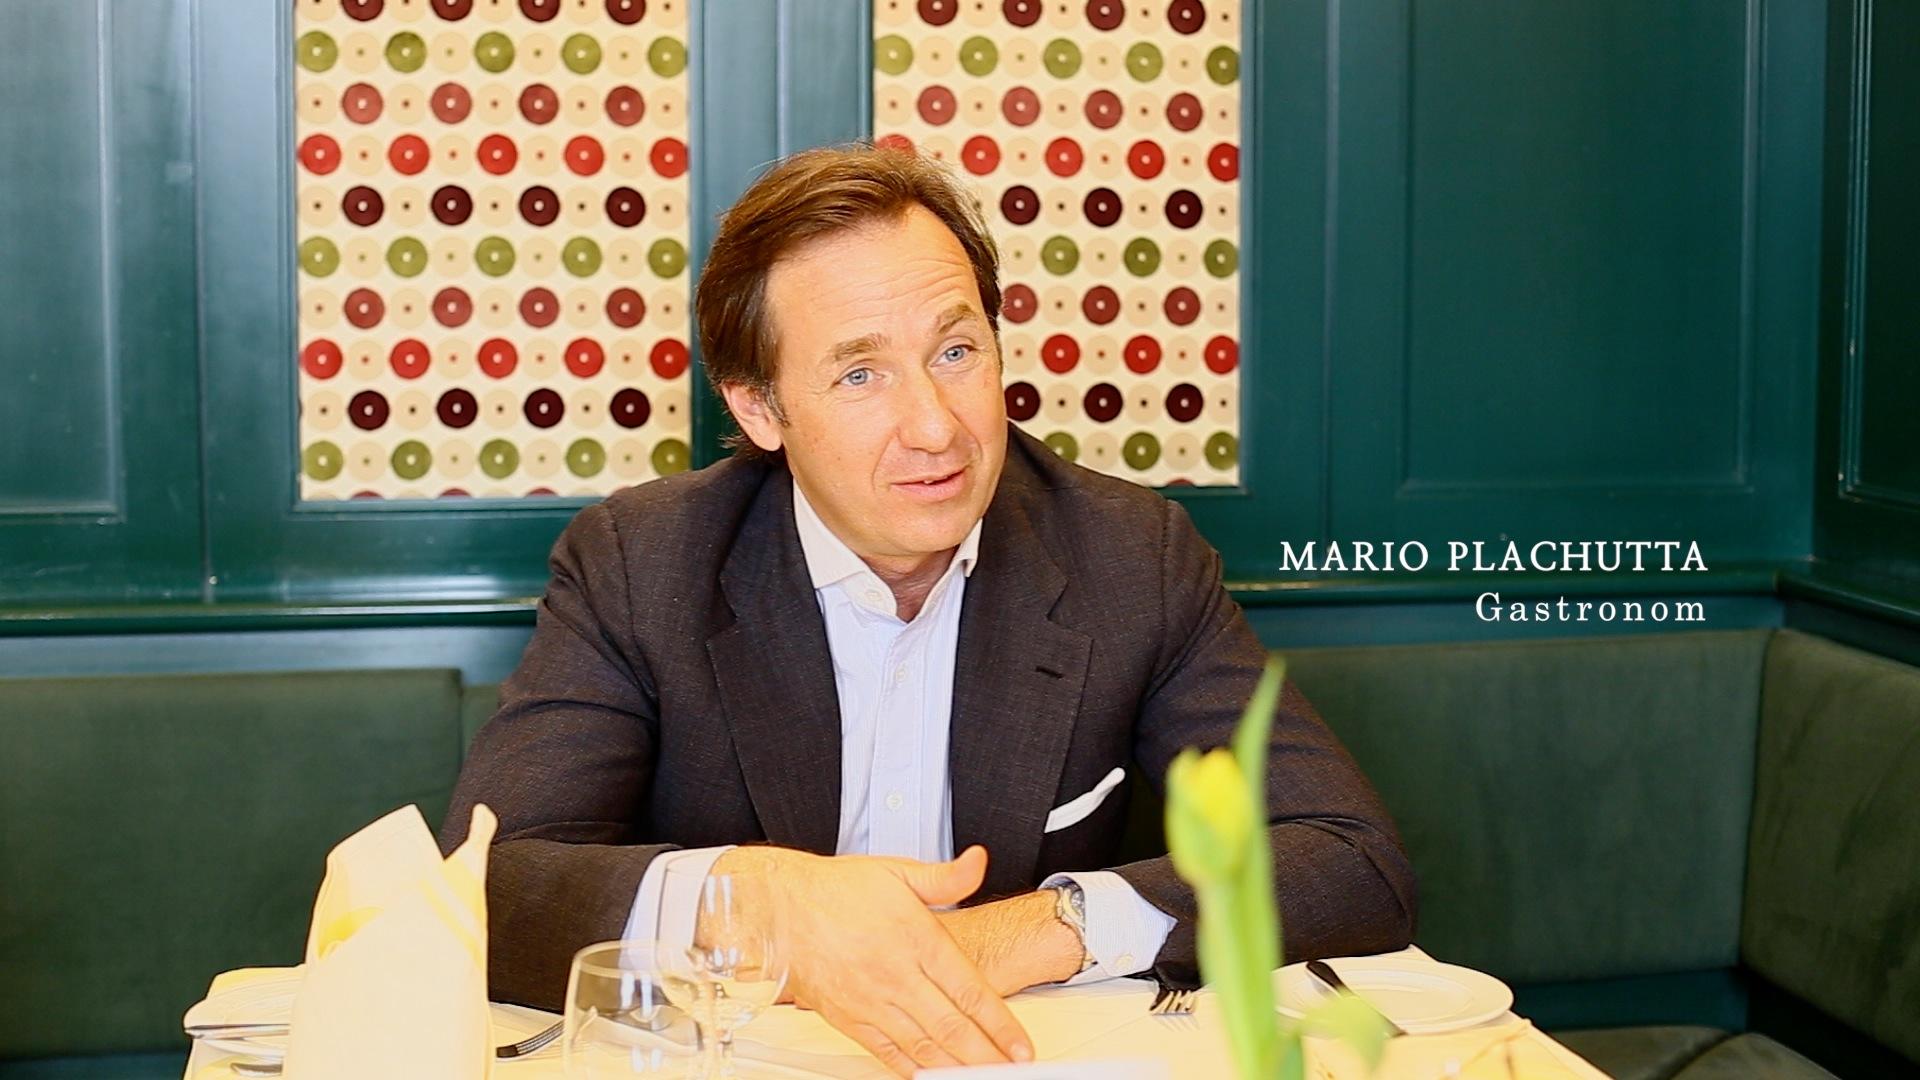 Mario Plachutta